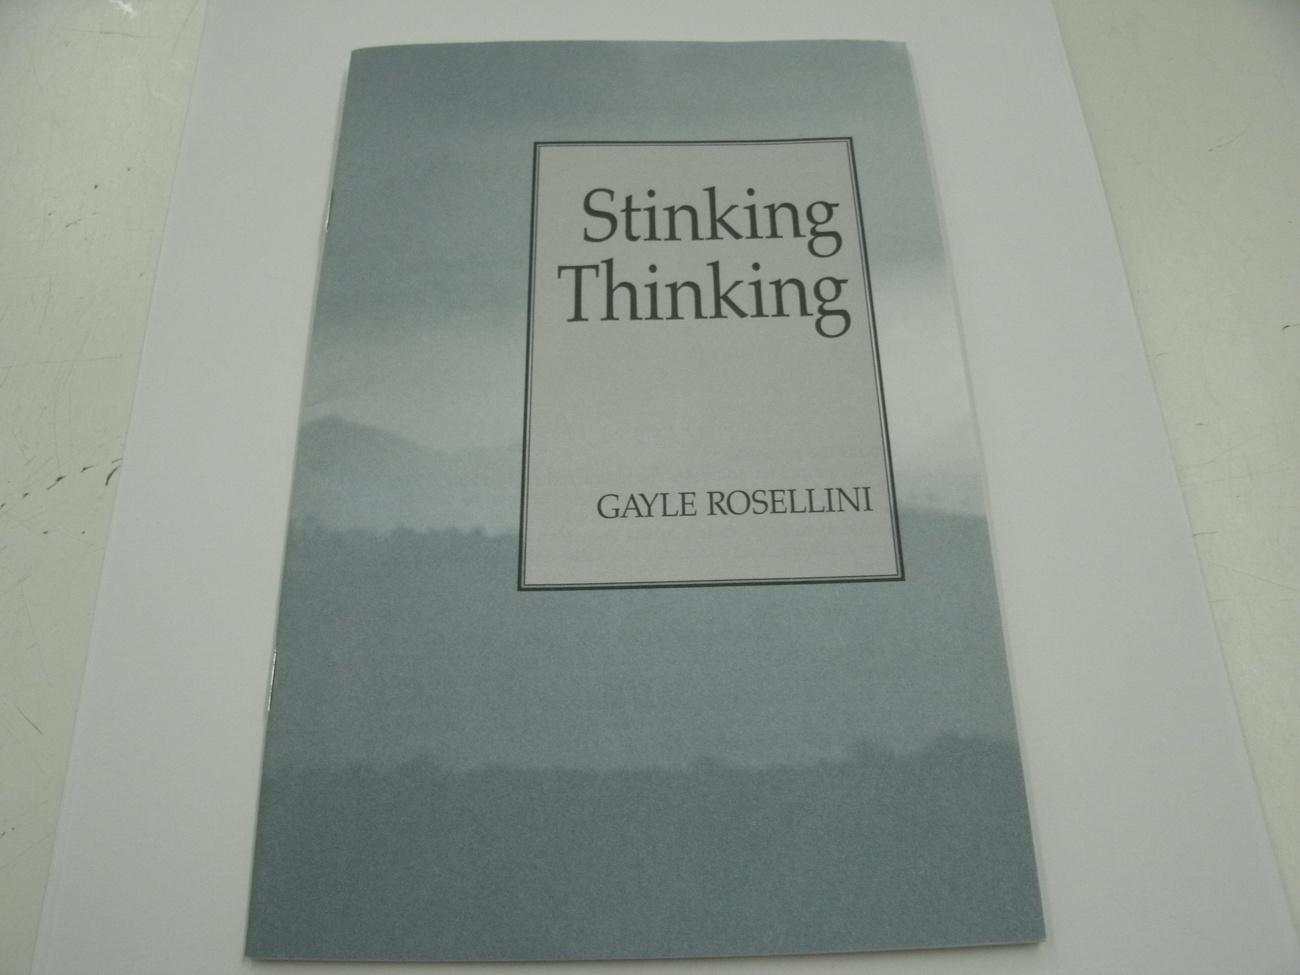 Stinking Thinking by Gayle Rosellini (1985, Paperback, Pamphlet)